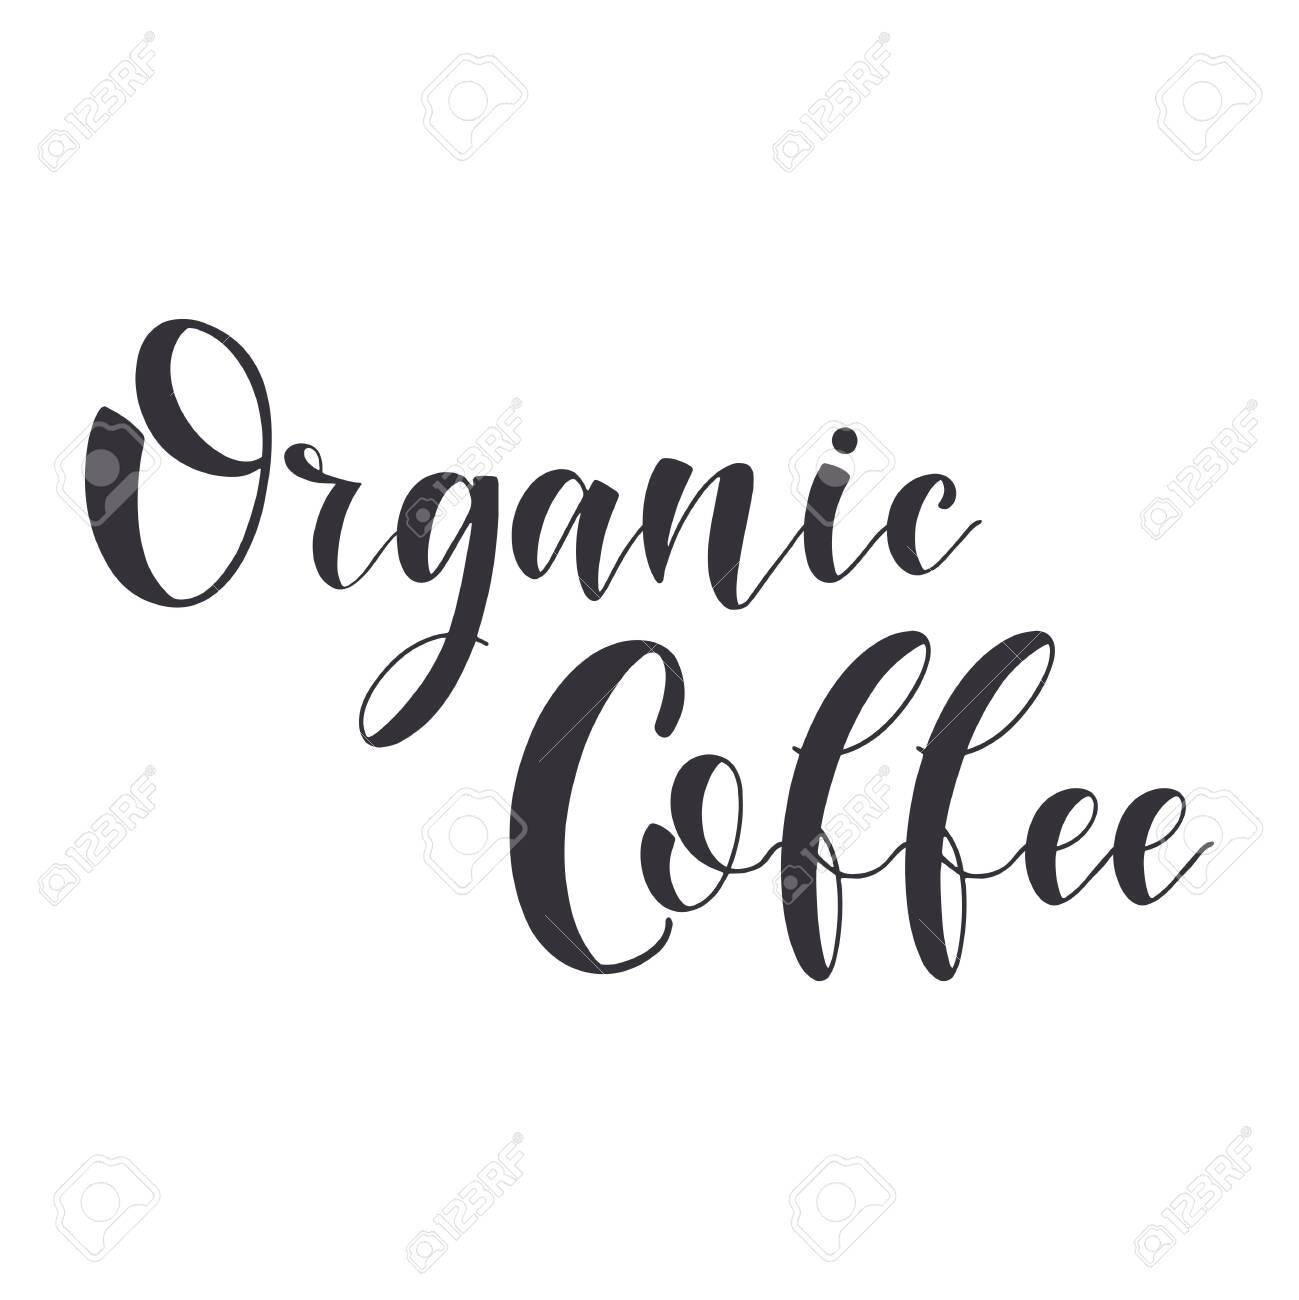 Coffee Quotes  Organic Coffee  Graphic design lifestyle texts